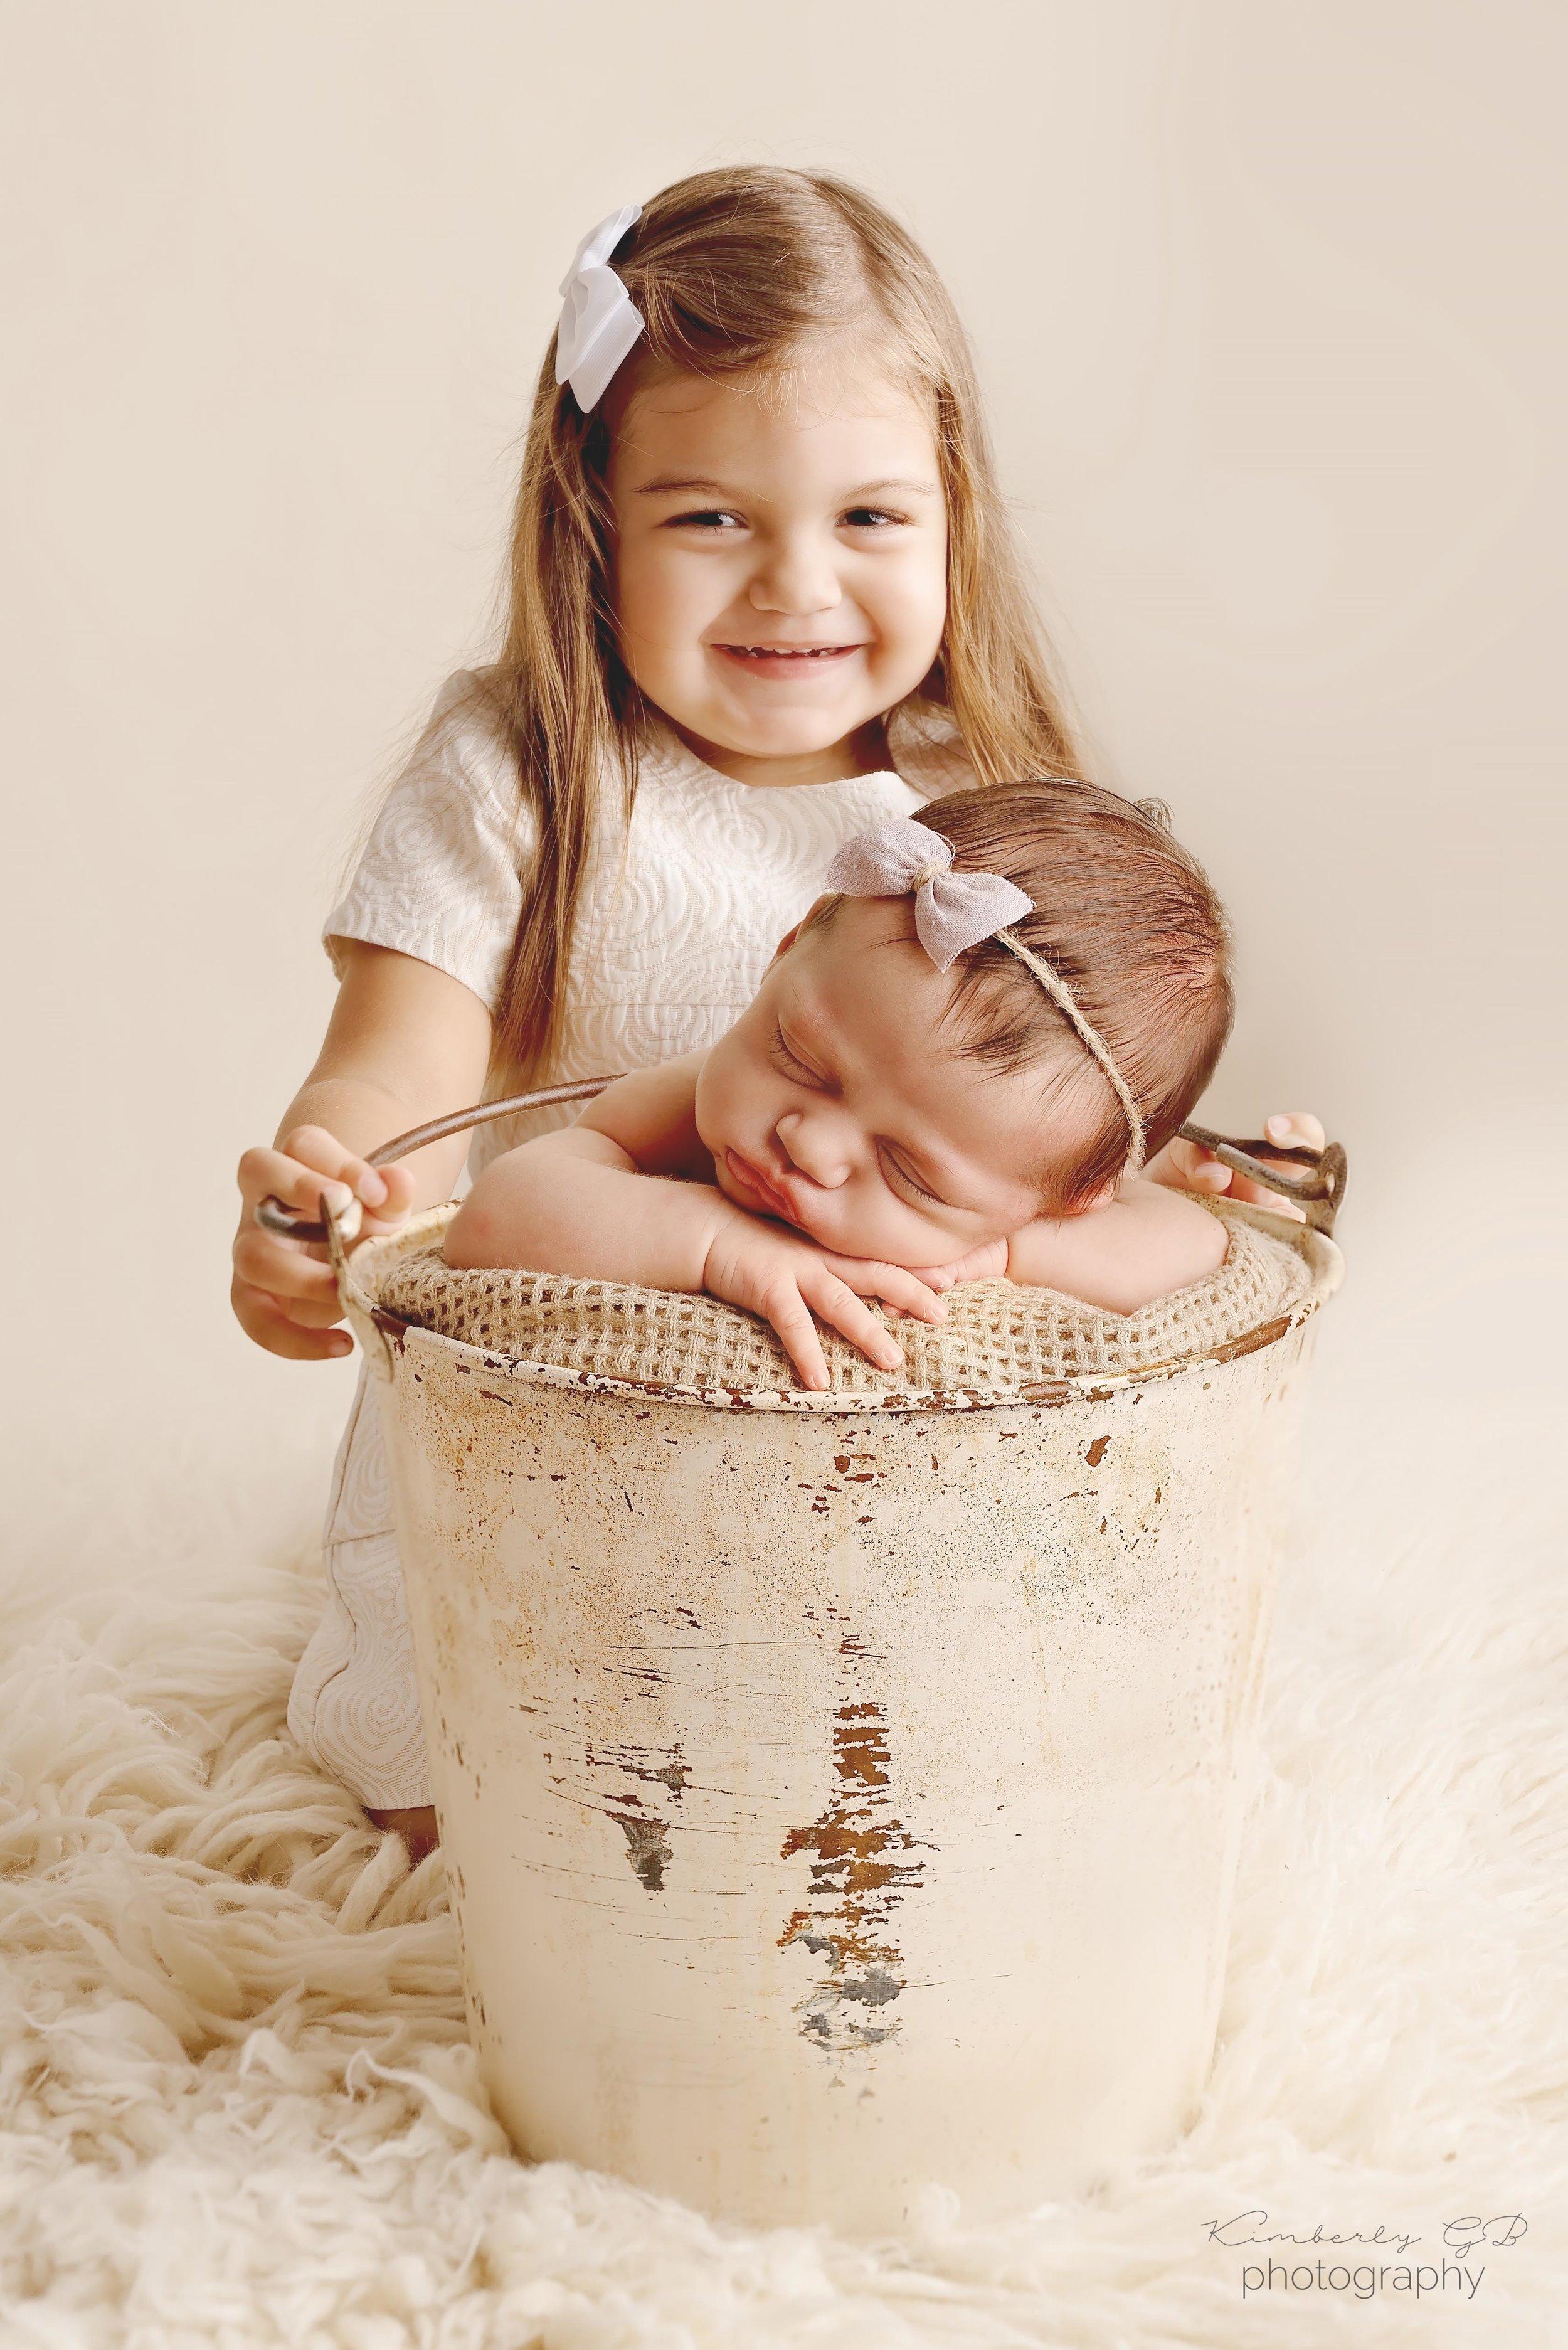 fotografia-de-recien-nacidos-bebes-newborn-en-puerto-rico-kimberly-gb-photography-fotografa-229.jpg